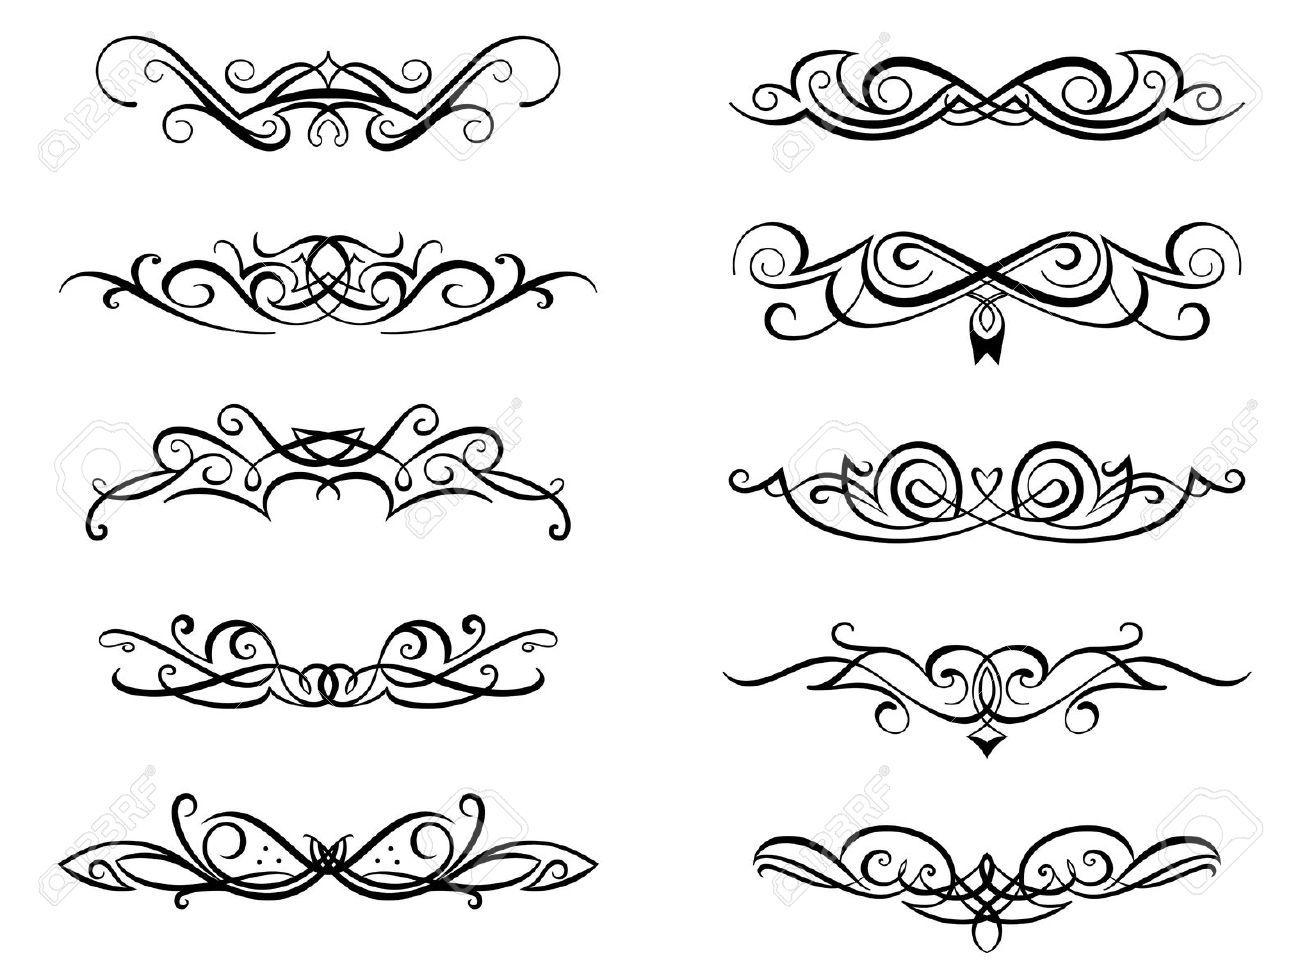 Vignettes And Monograms Set In Vintage Floral Style For Design Vintage Floral Style Royalty Free Photography Monogram